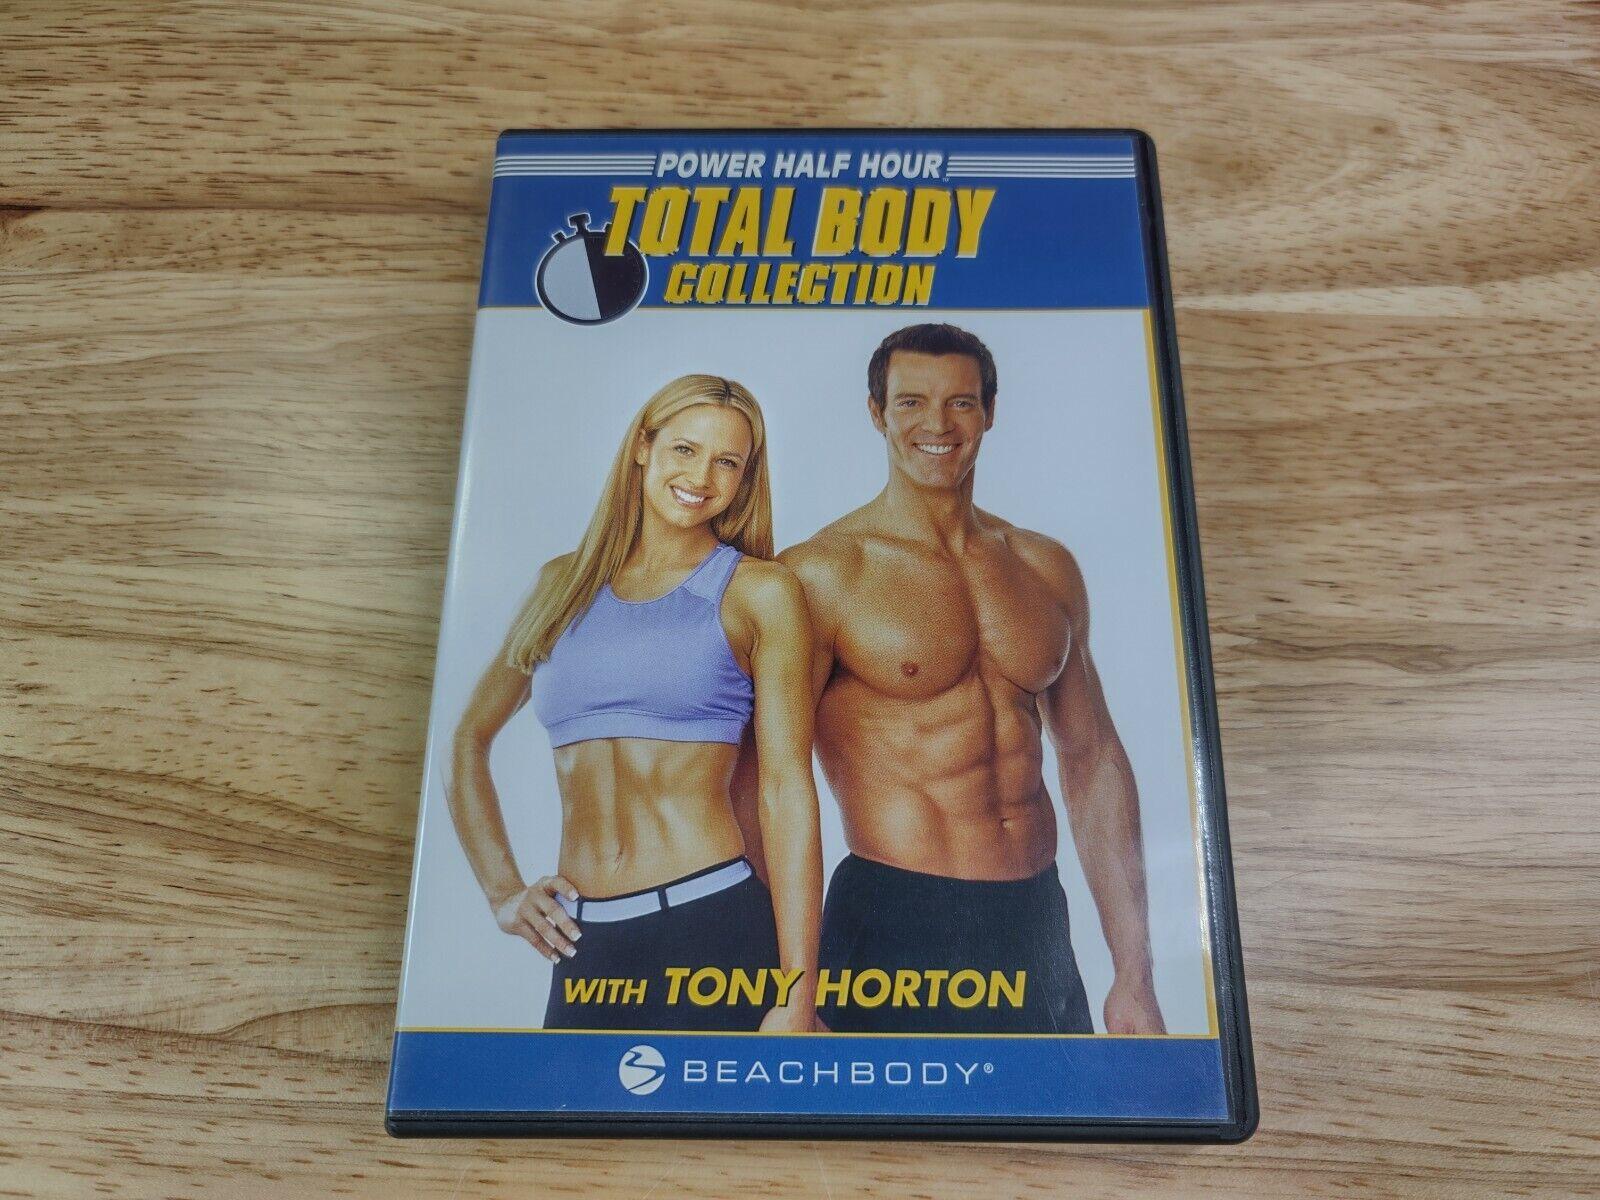 Power Half Hour Total Body Collection With Tony Horton Beachbody DVD Good - $9.95